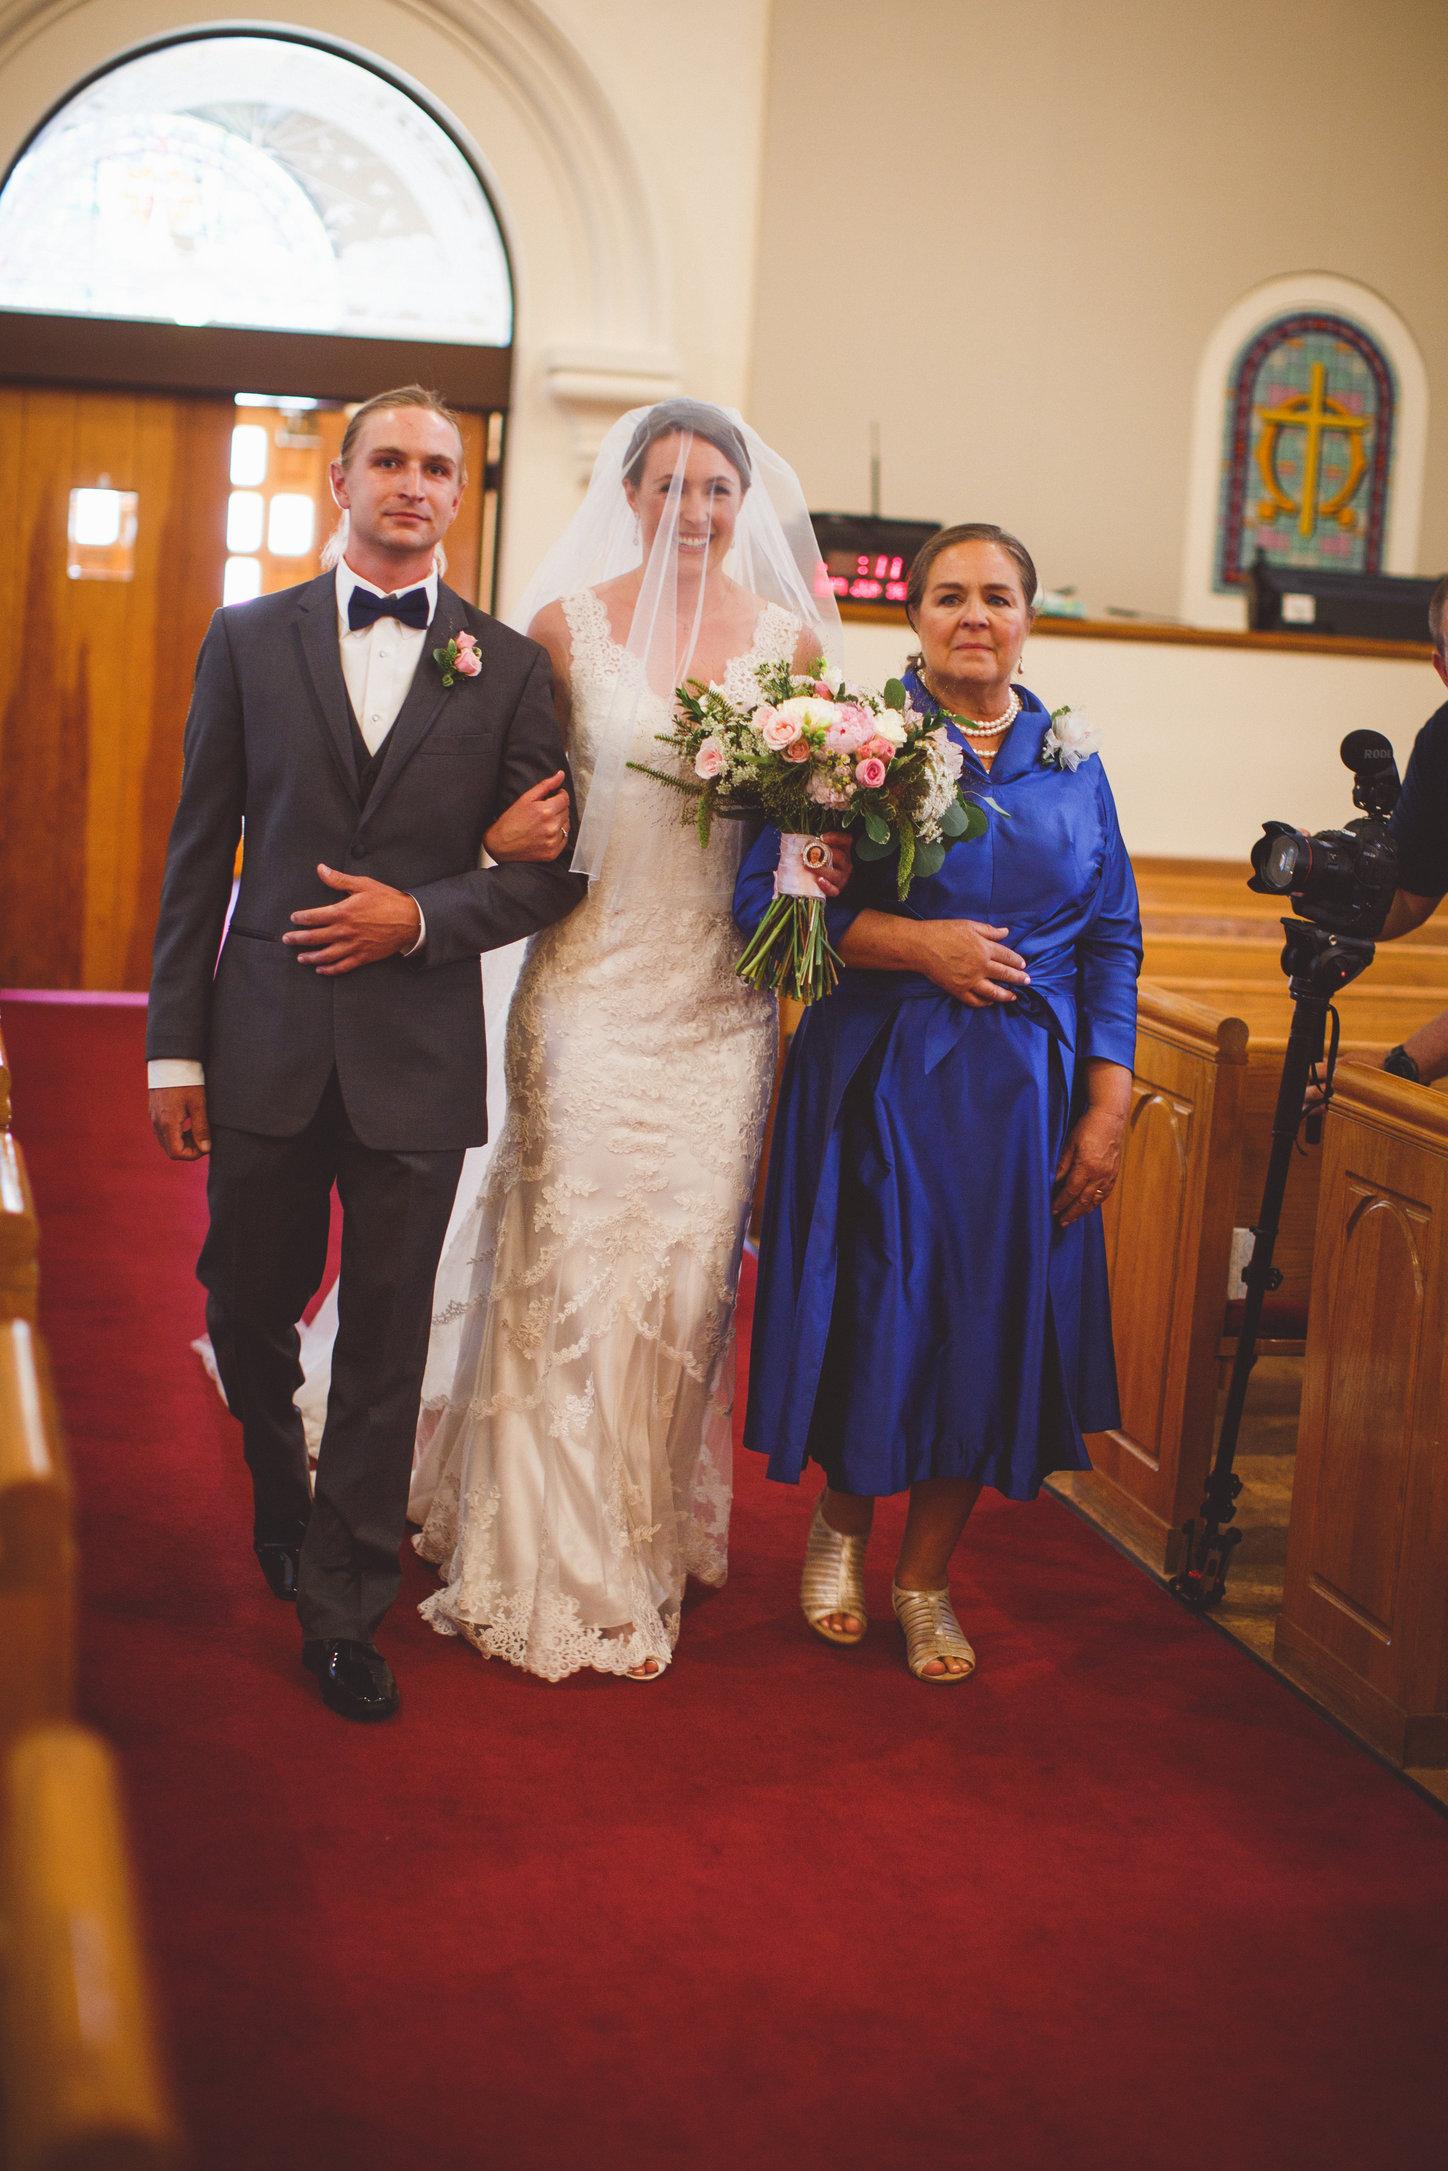 SandC-wedding-169.jpg